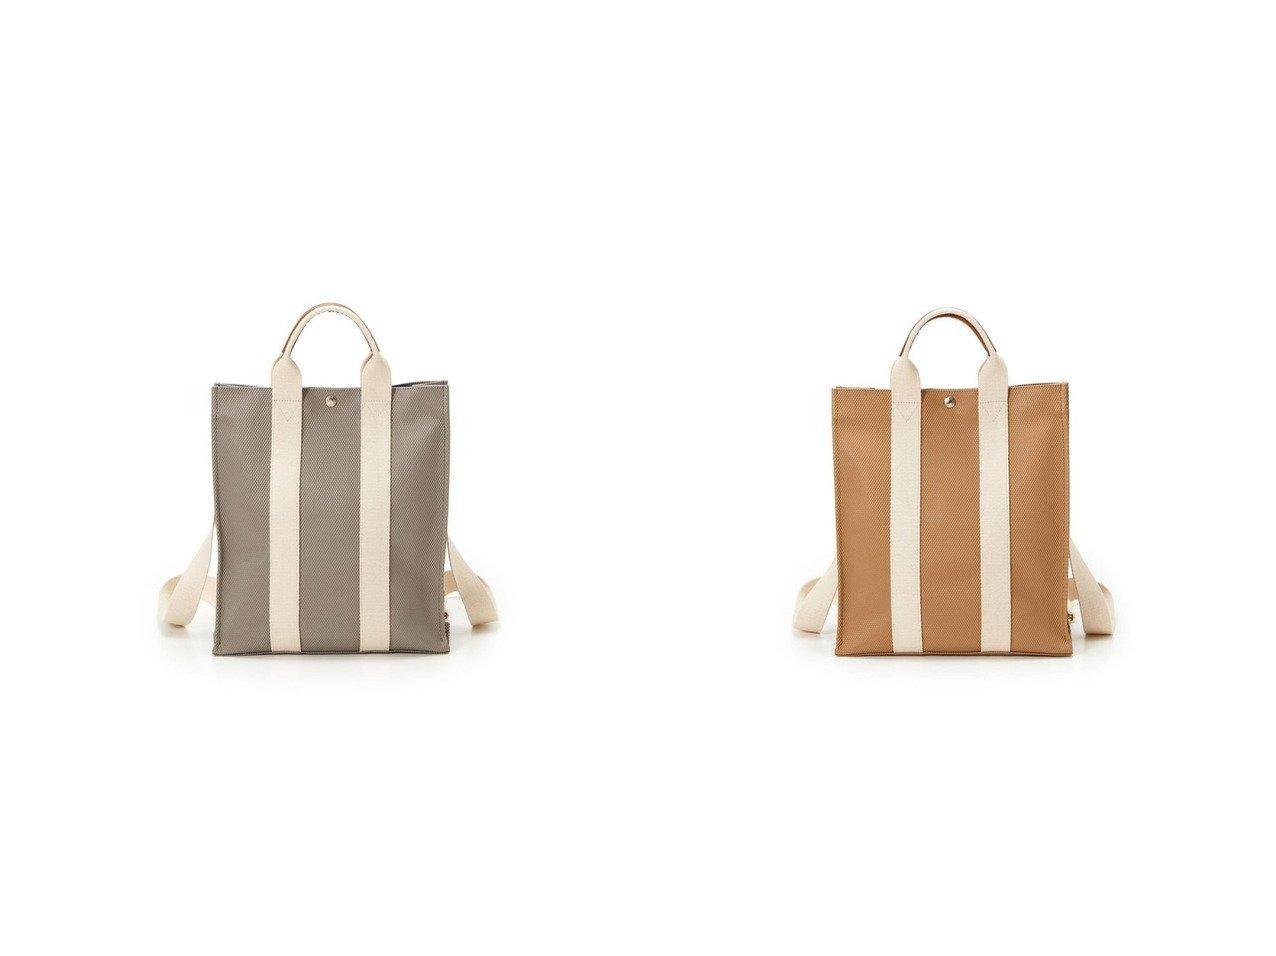 【TOPKAPI BREATH/トプカピ ブレス】のオリジナルPVC A4 縦型 バックパック 【バッグ・鞄】おすすめ!人気、トレンド・レディースファッションの通販   おすすめで人気の流行・トレンド、ファッションの通販商品 インテリア・家具・メンズファッション・キッズファッション・レディースファッション・服の通販 founy(ファニー) https://founy.com/ ファッション Fashion レディースファッション WOMEN バッグ Bag スクエア フォルム リュック 日本製 Made in Japan |ID:crp329100000064849